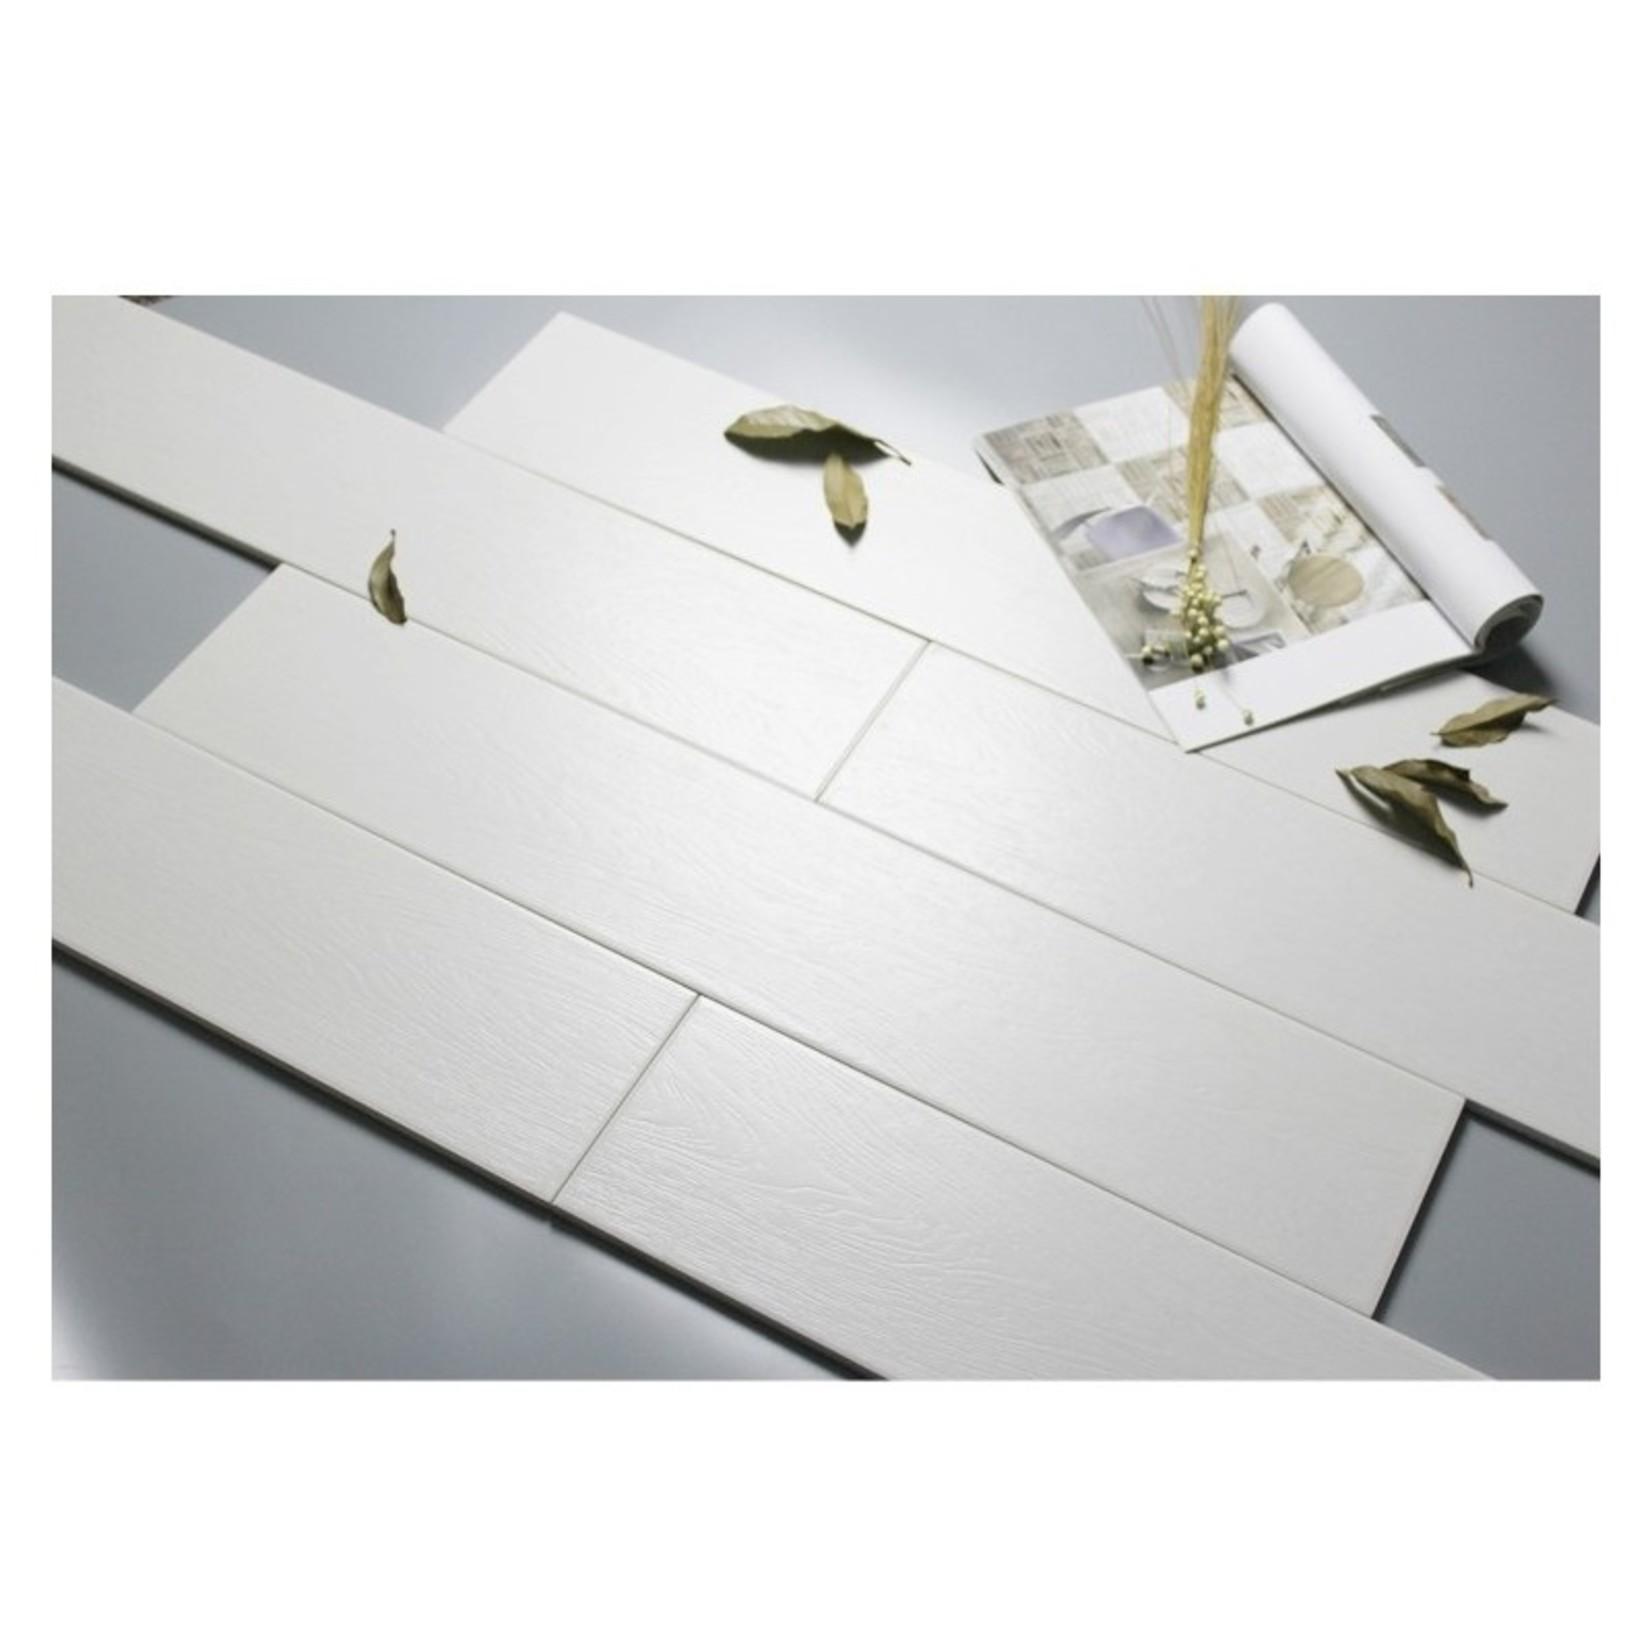 Ceramique 631.5 -1580186 imitation bois blanc